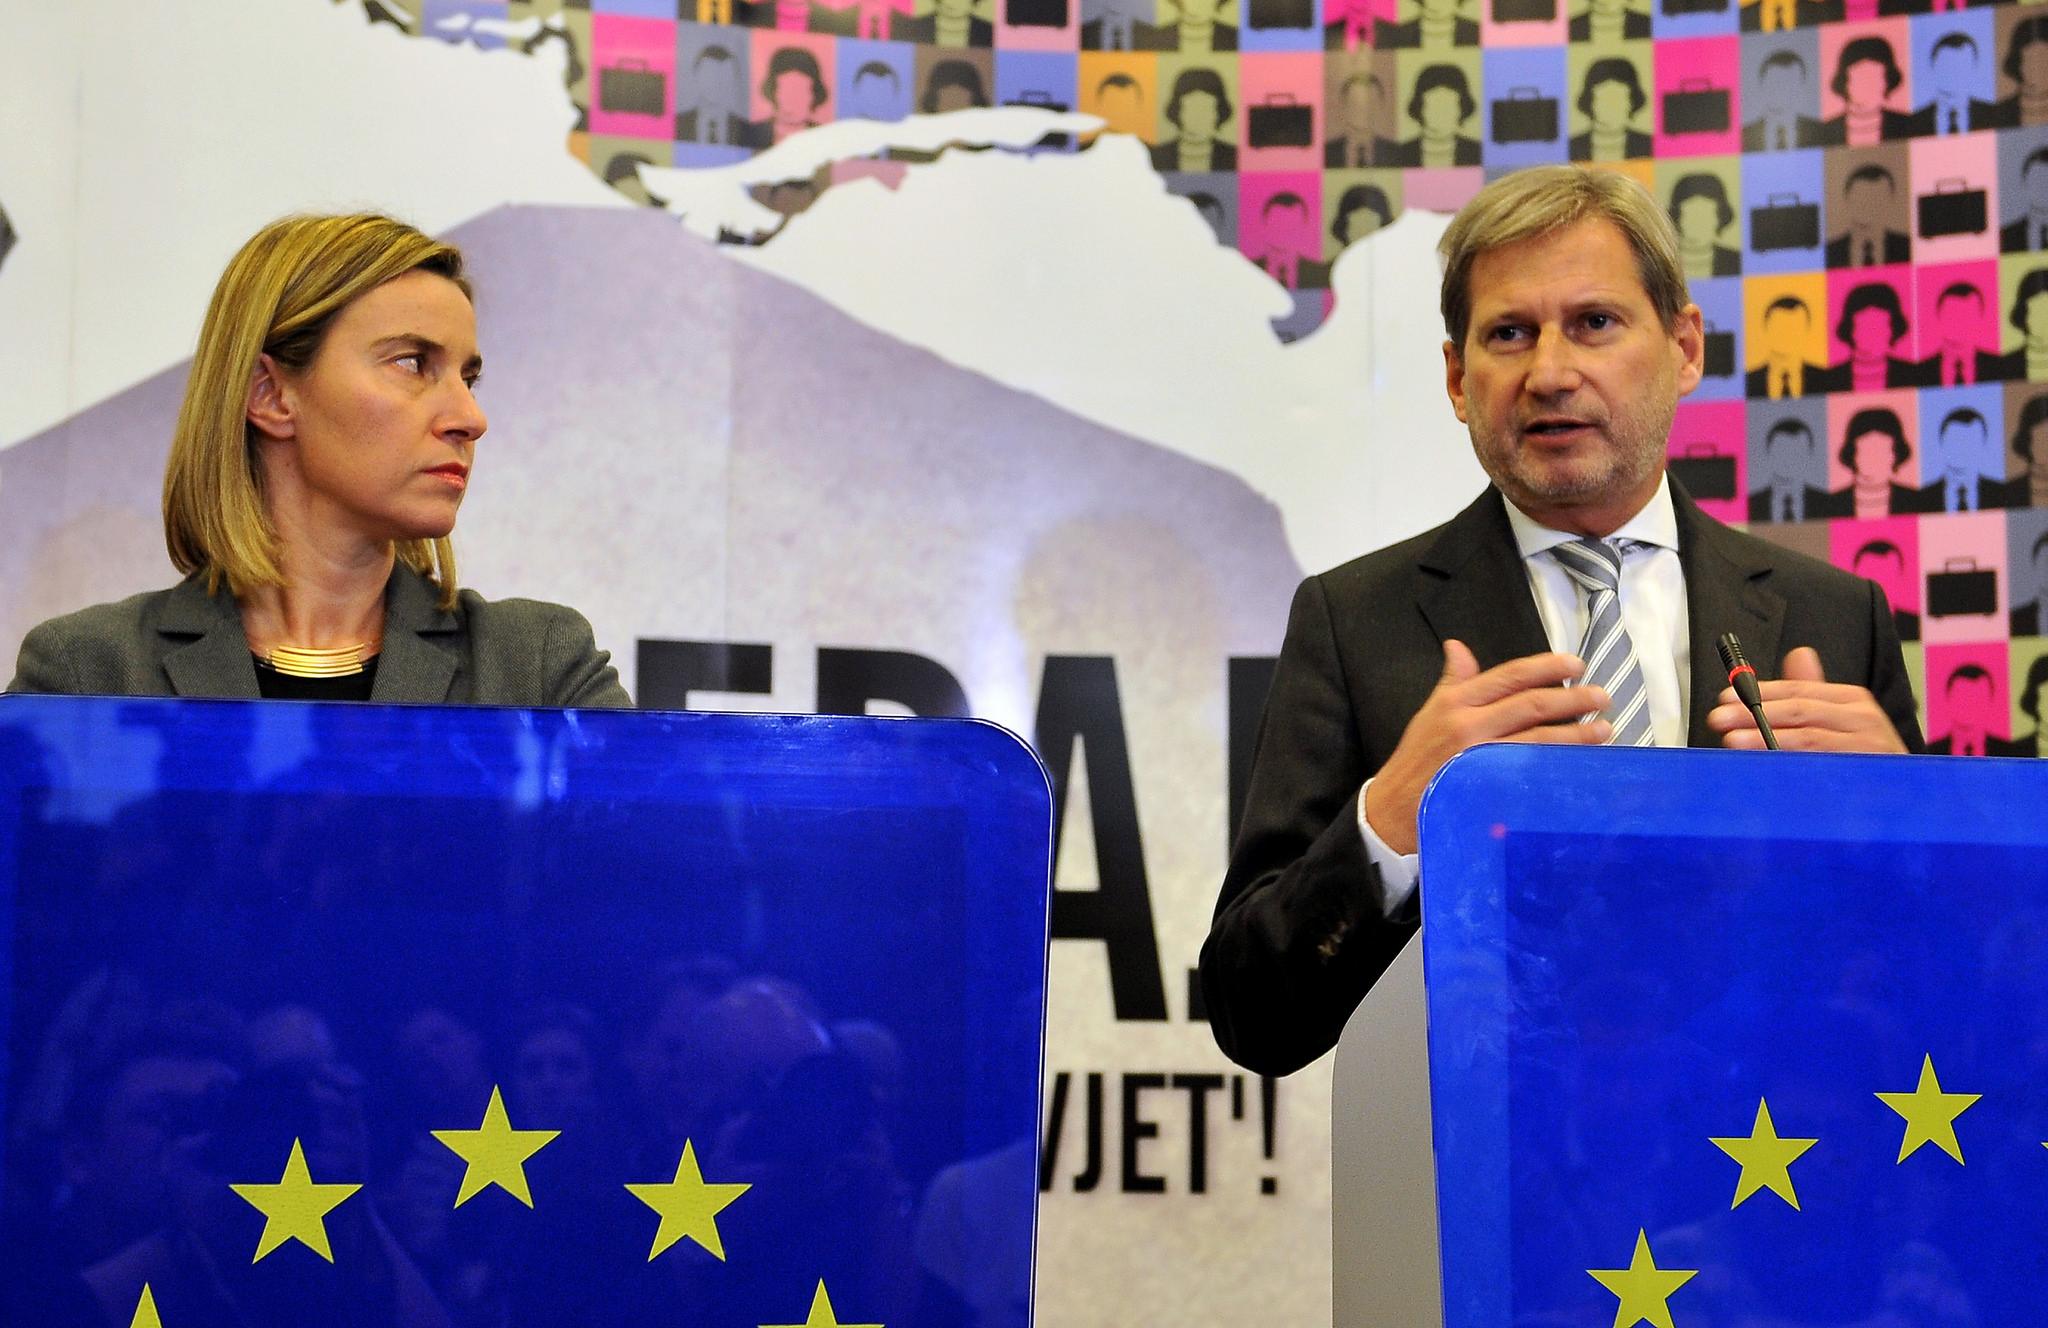 Federica Mogherini e Johannes Hahn a Sarajevo, 5 dicembre 2014 (Foto EEAS, Flickr)